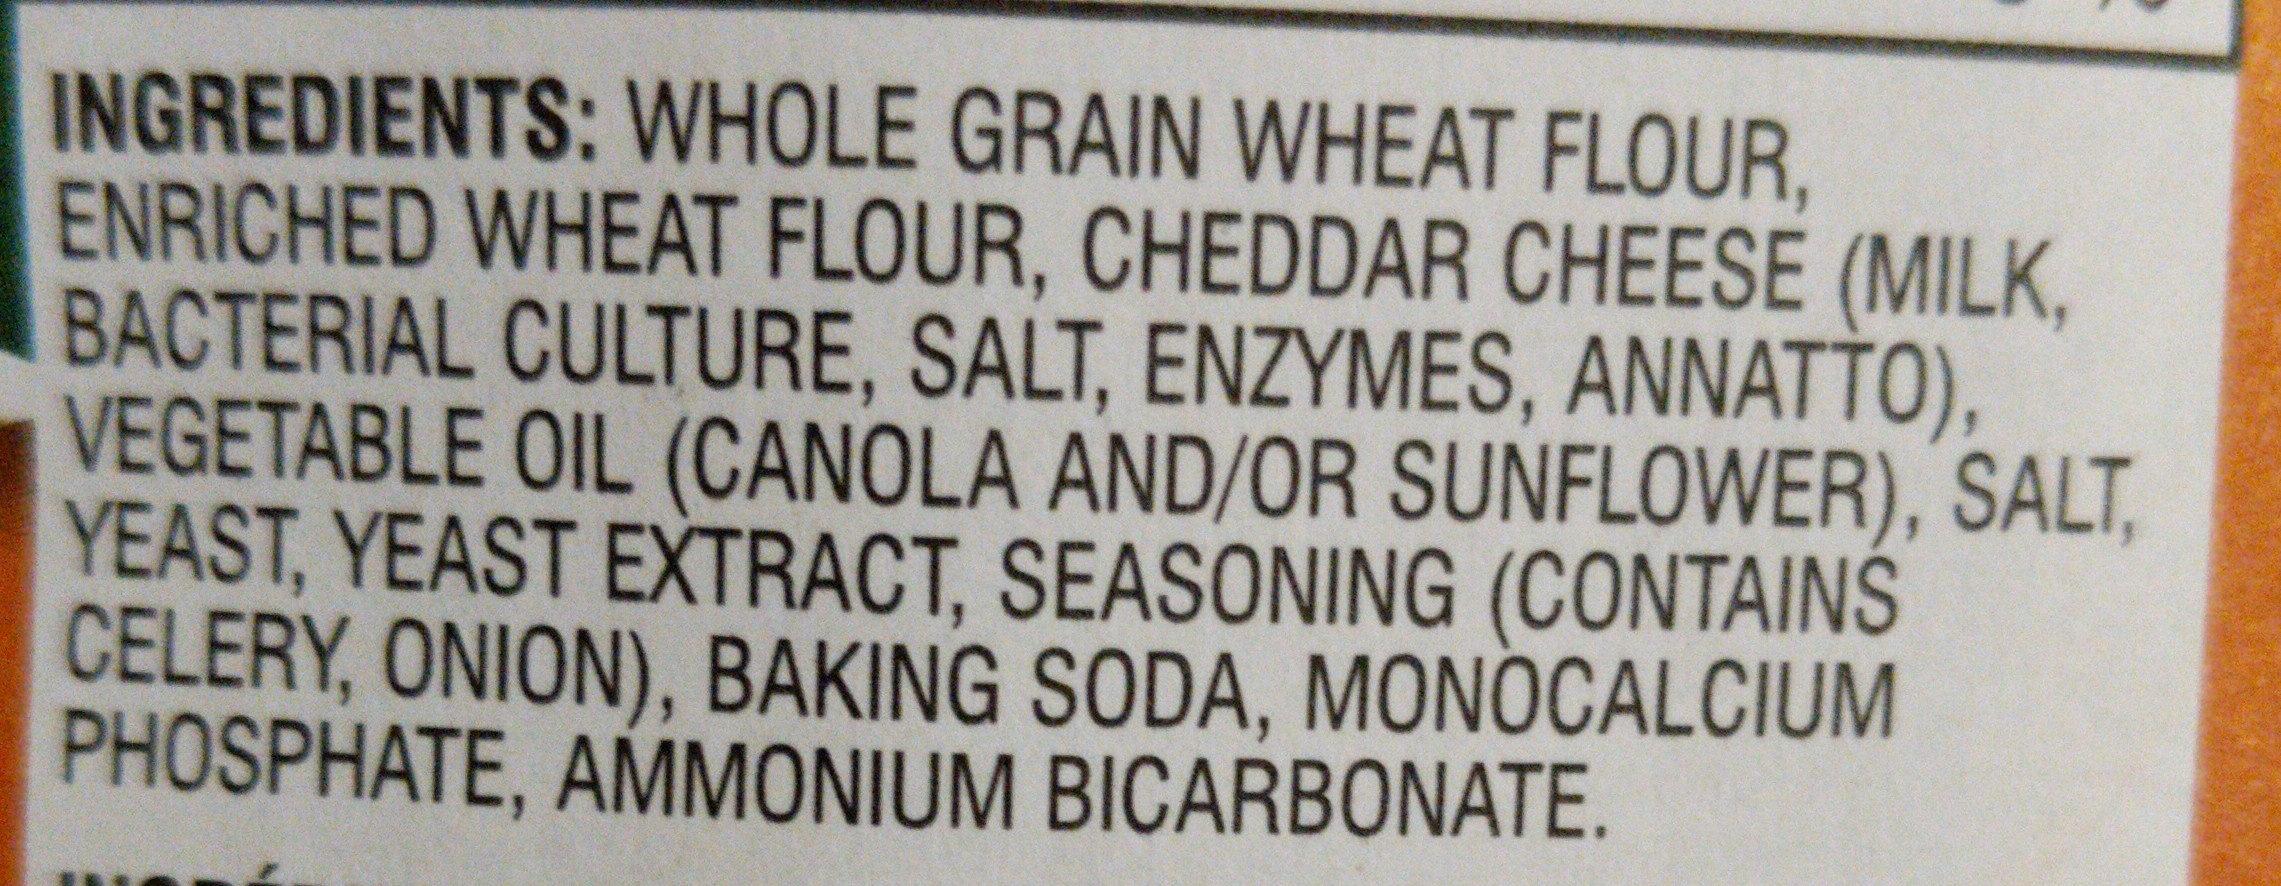 Goldfish Cheddar - Ingredients - en